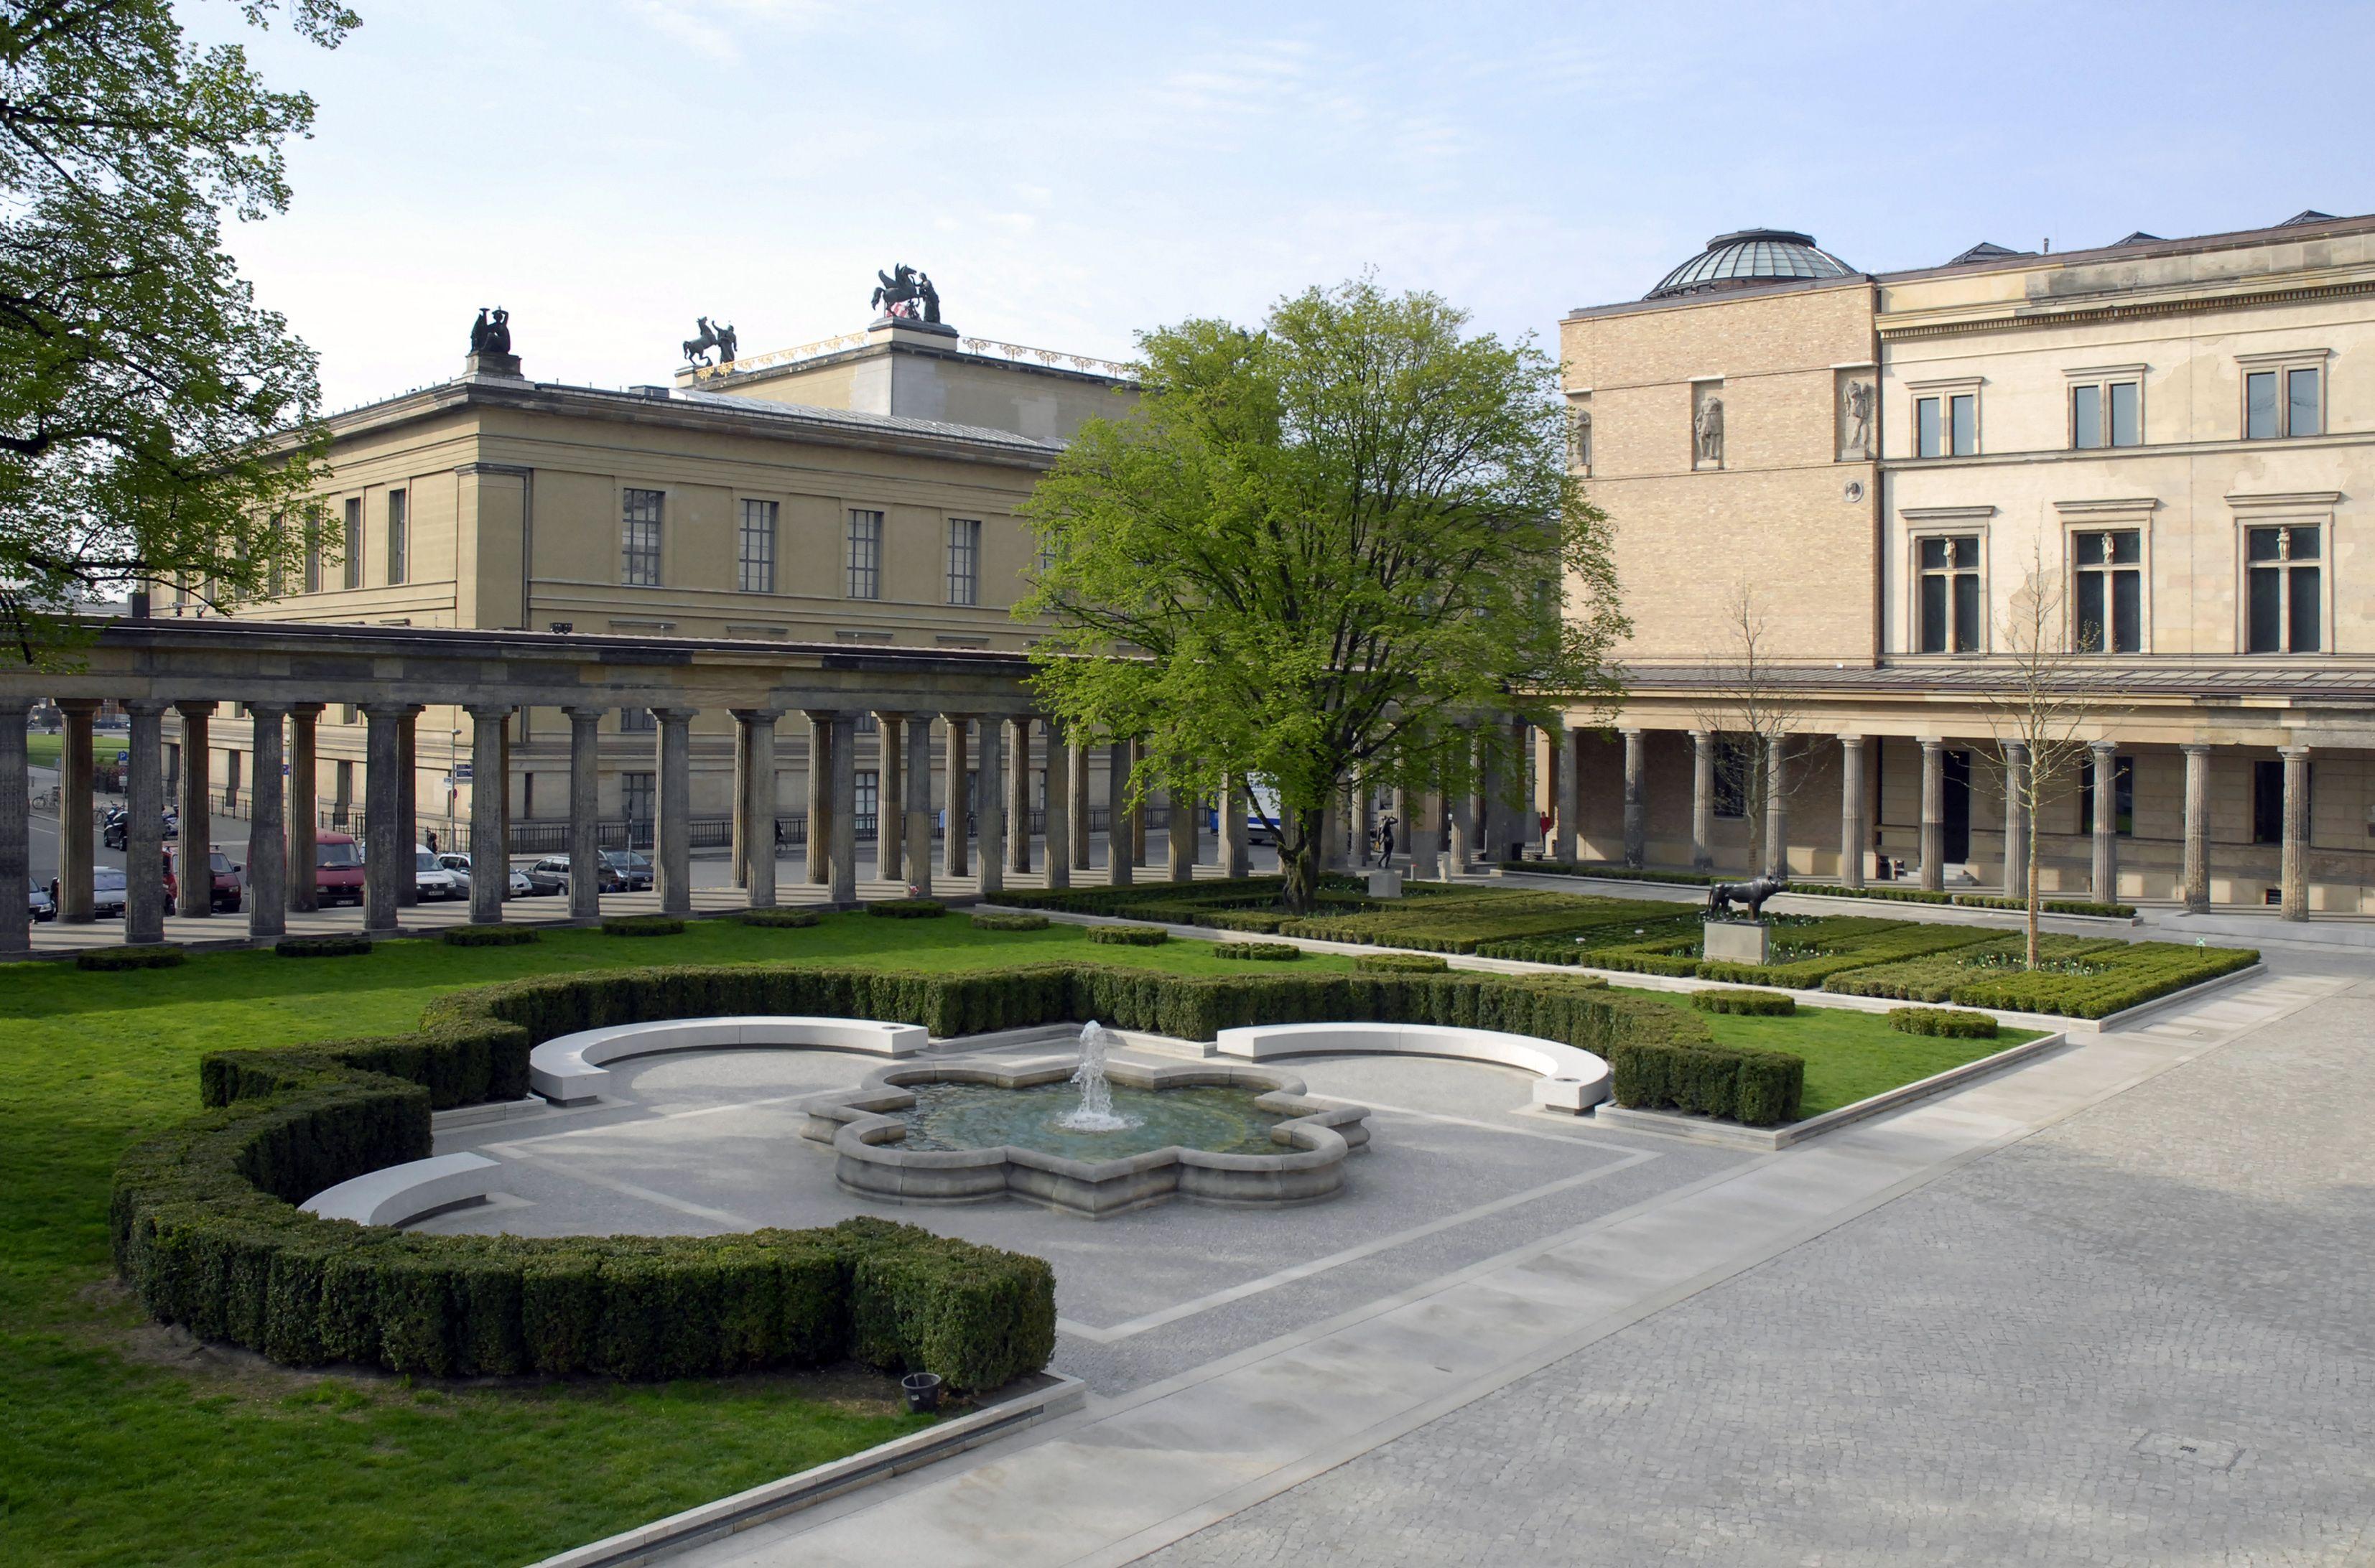 Kolonnadenhof Mit Blick Auf Altes Museum Und Neues Museum Museumsinsel Berlin Bodestrasse 1 3 Berlin Museum Germany Travel